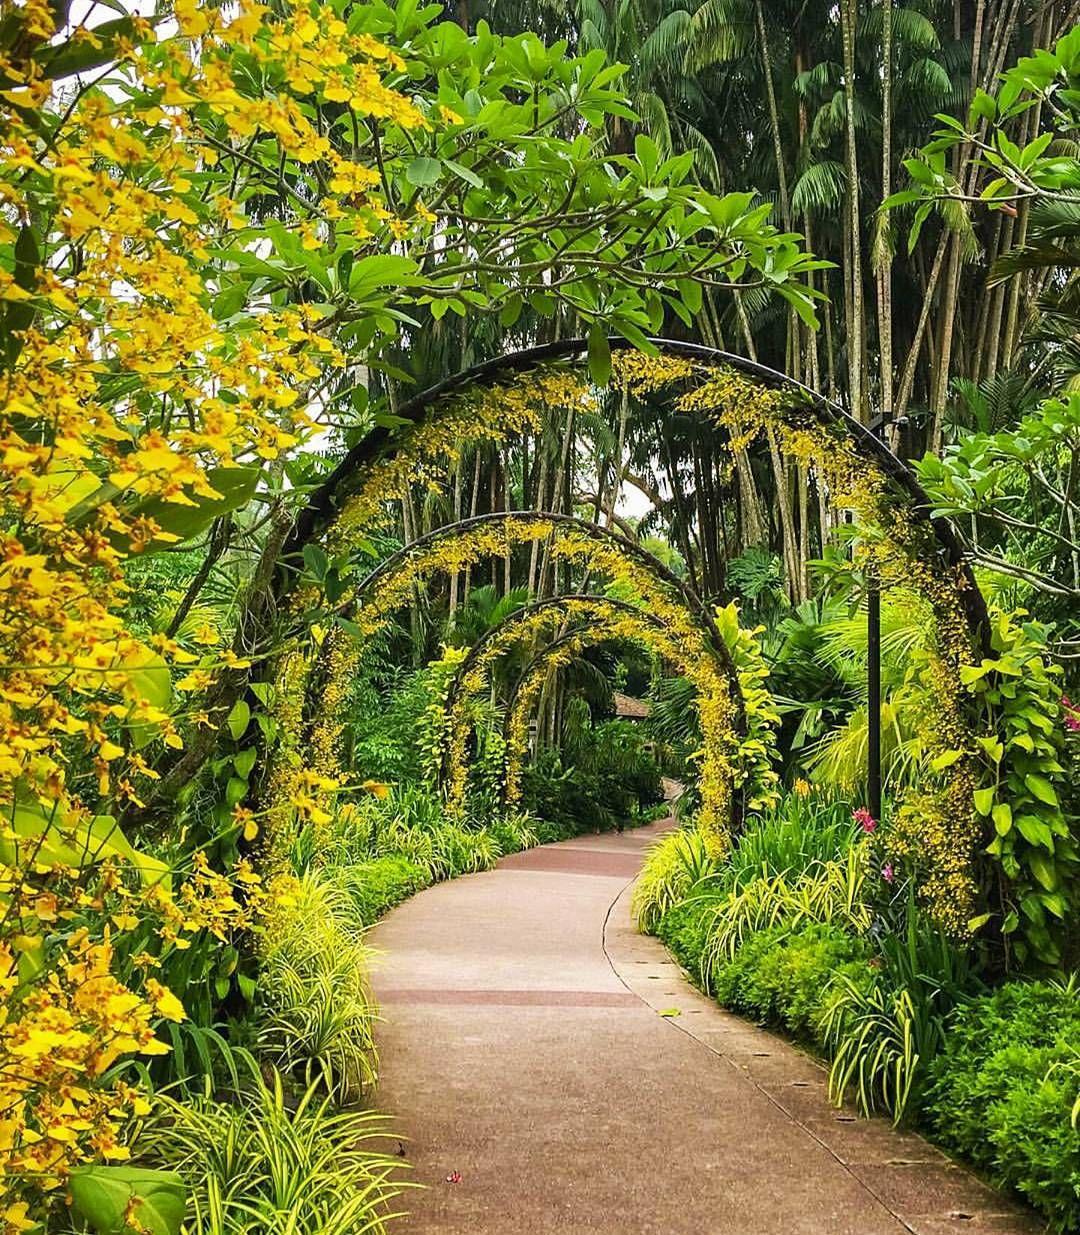 Singapore Botanic Gardens Photo by ivanaljubas by